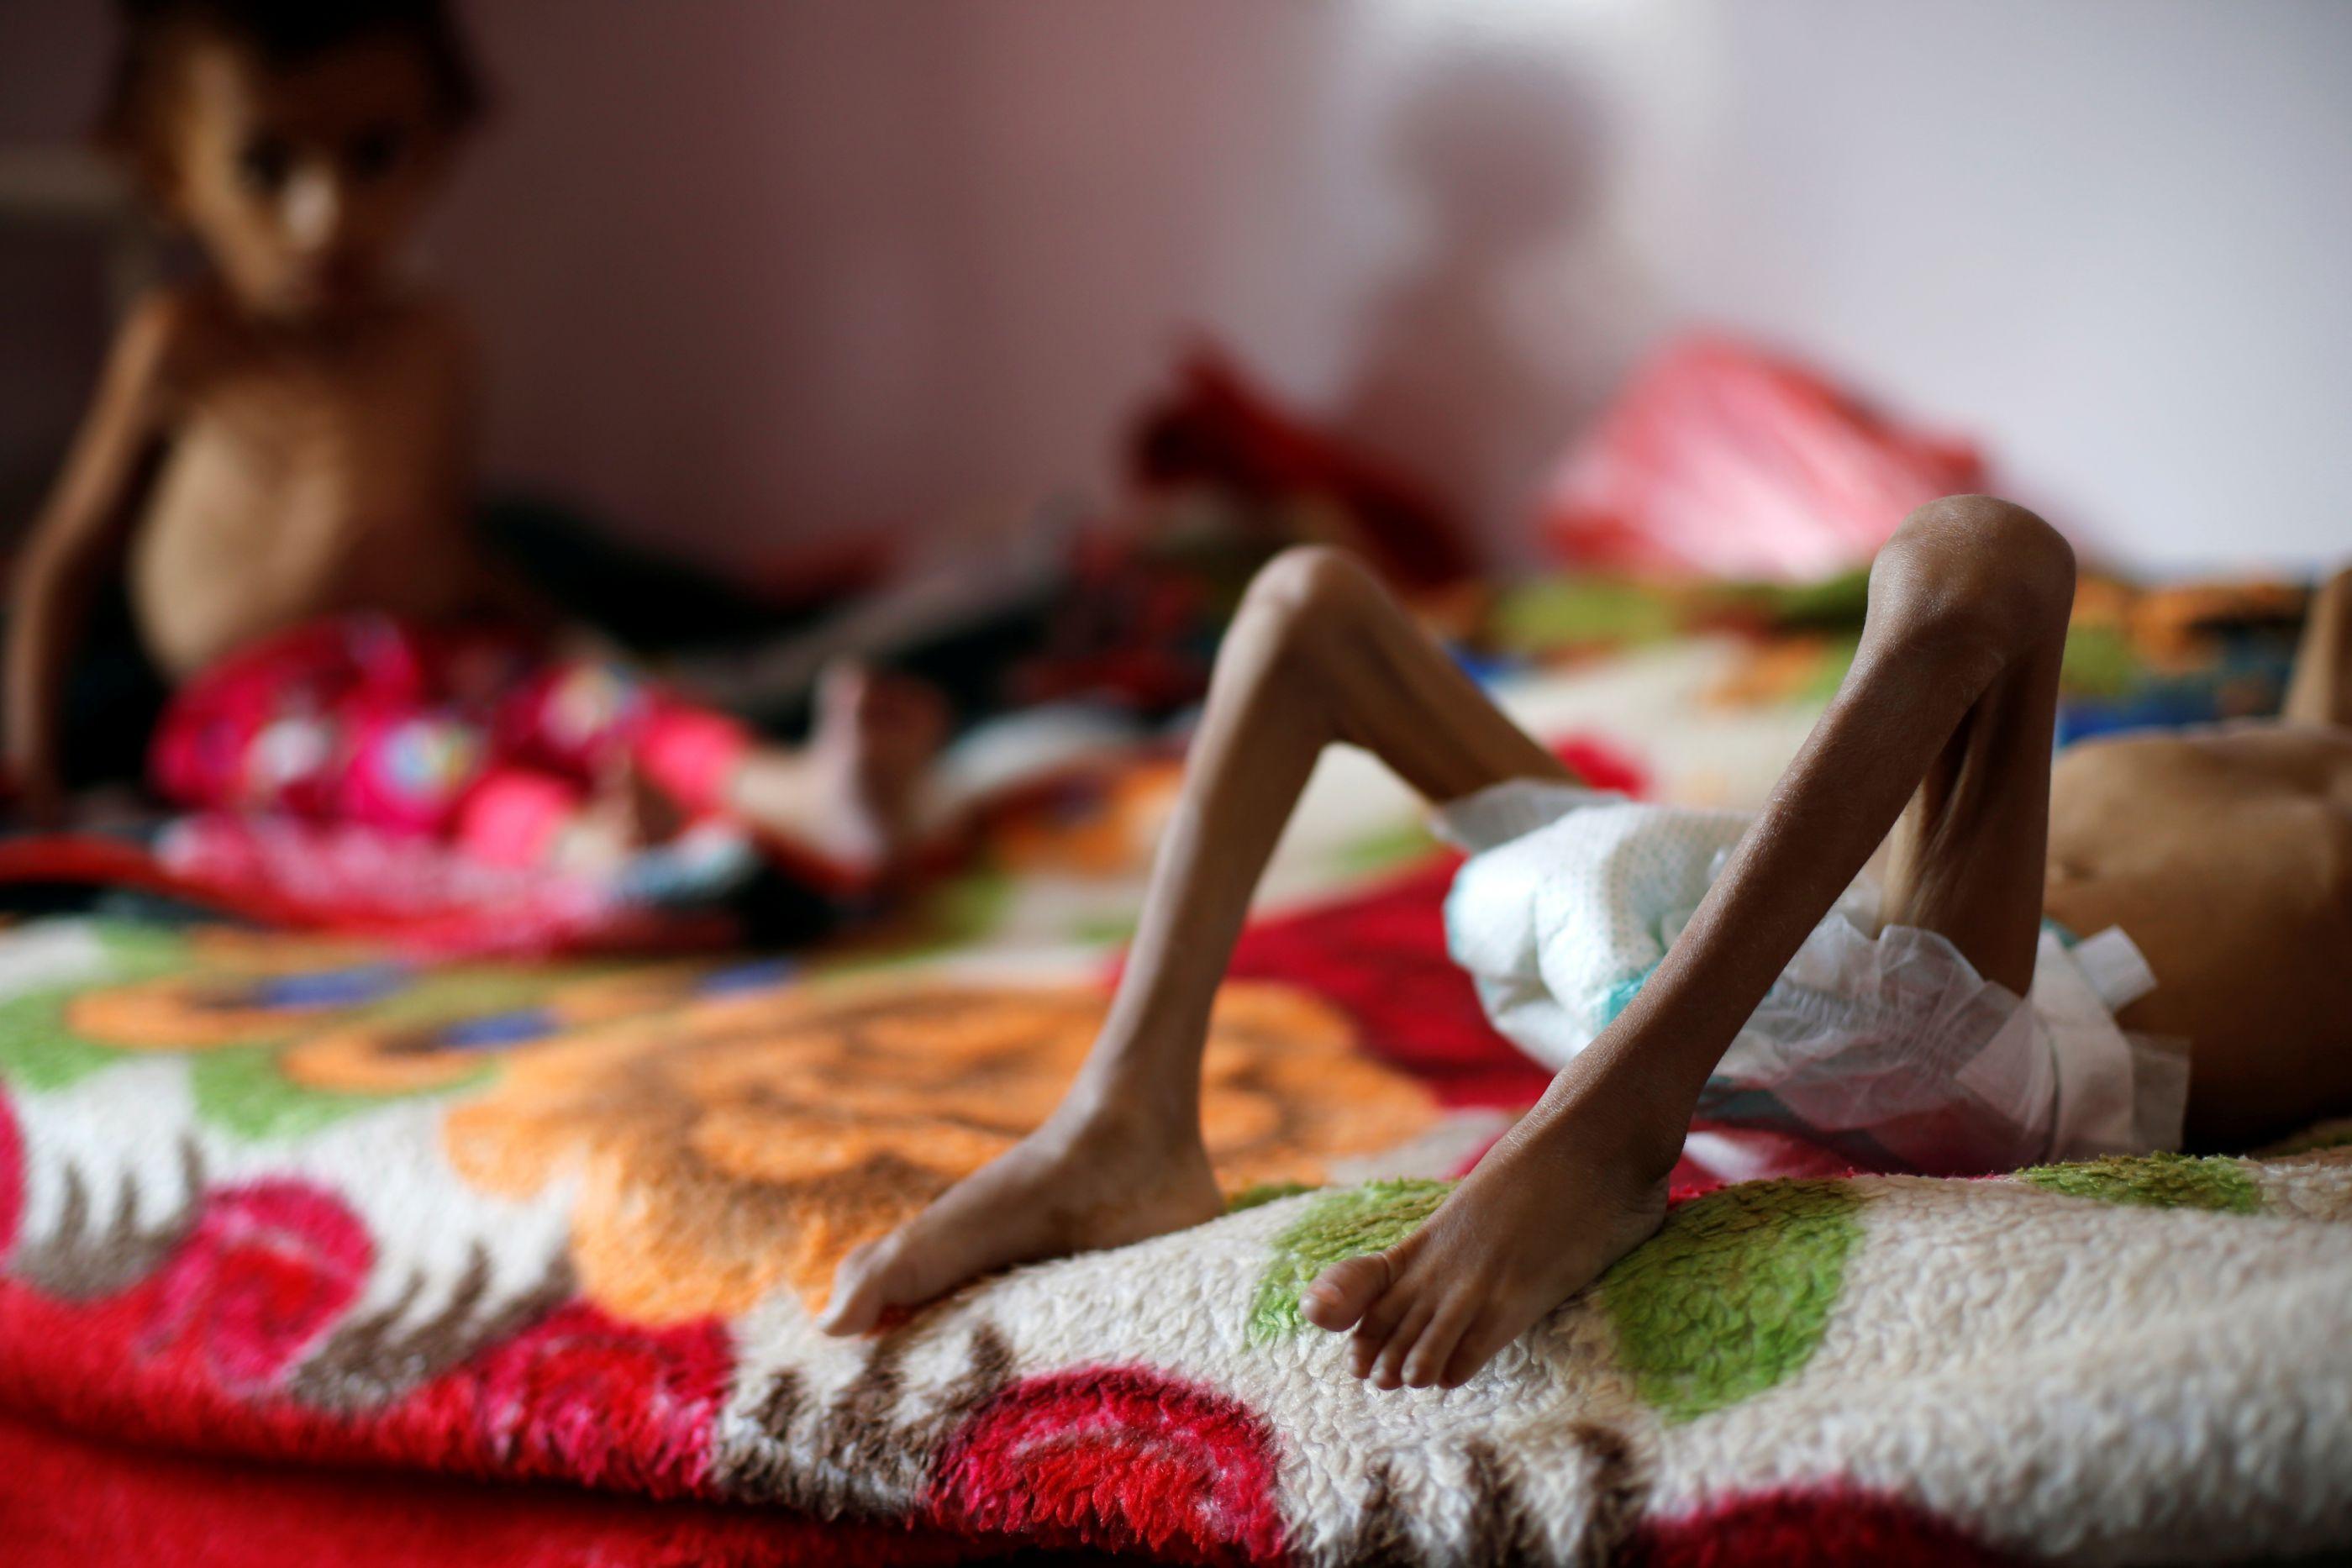 Morreu Amal, a menina que virou símbolo da fome e guerra no Iémen